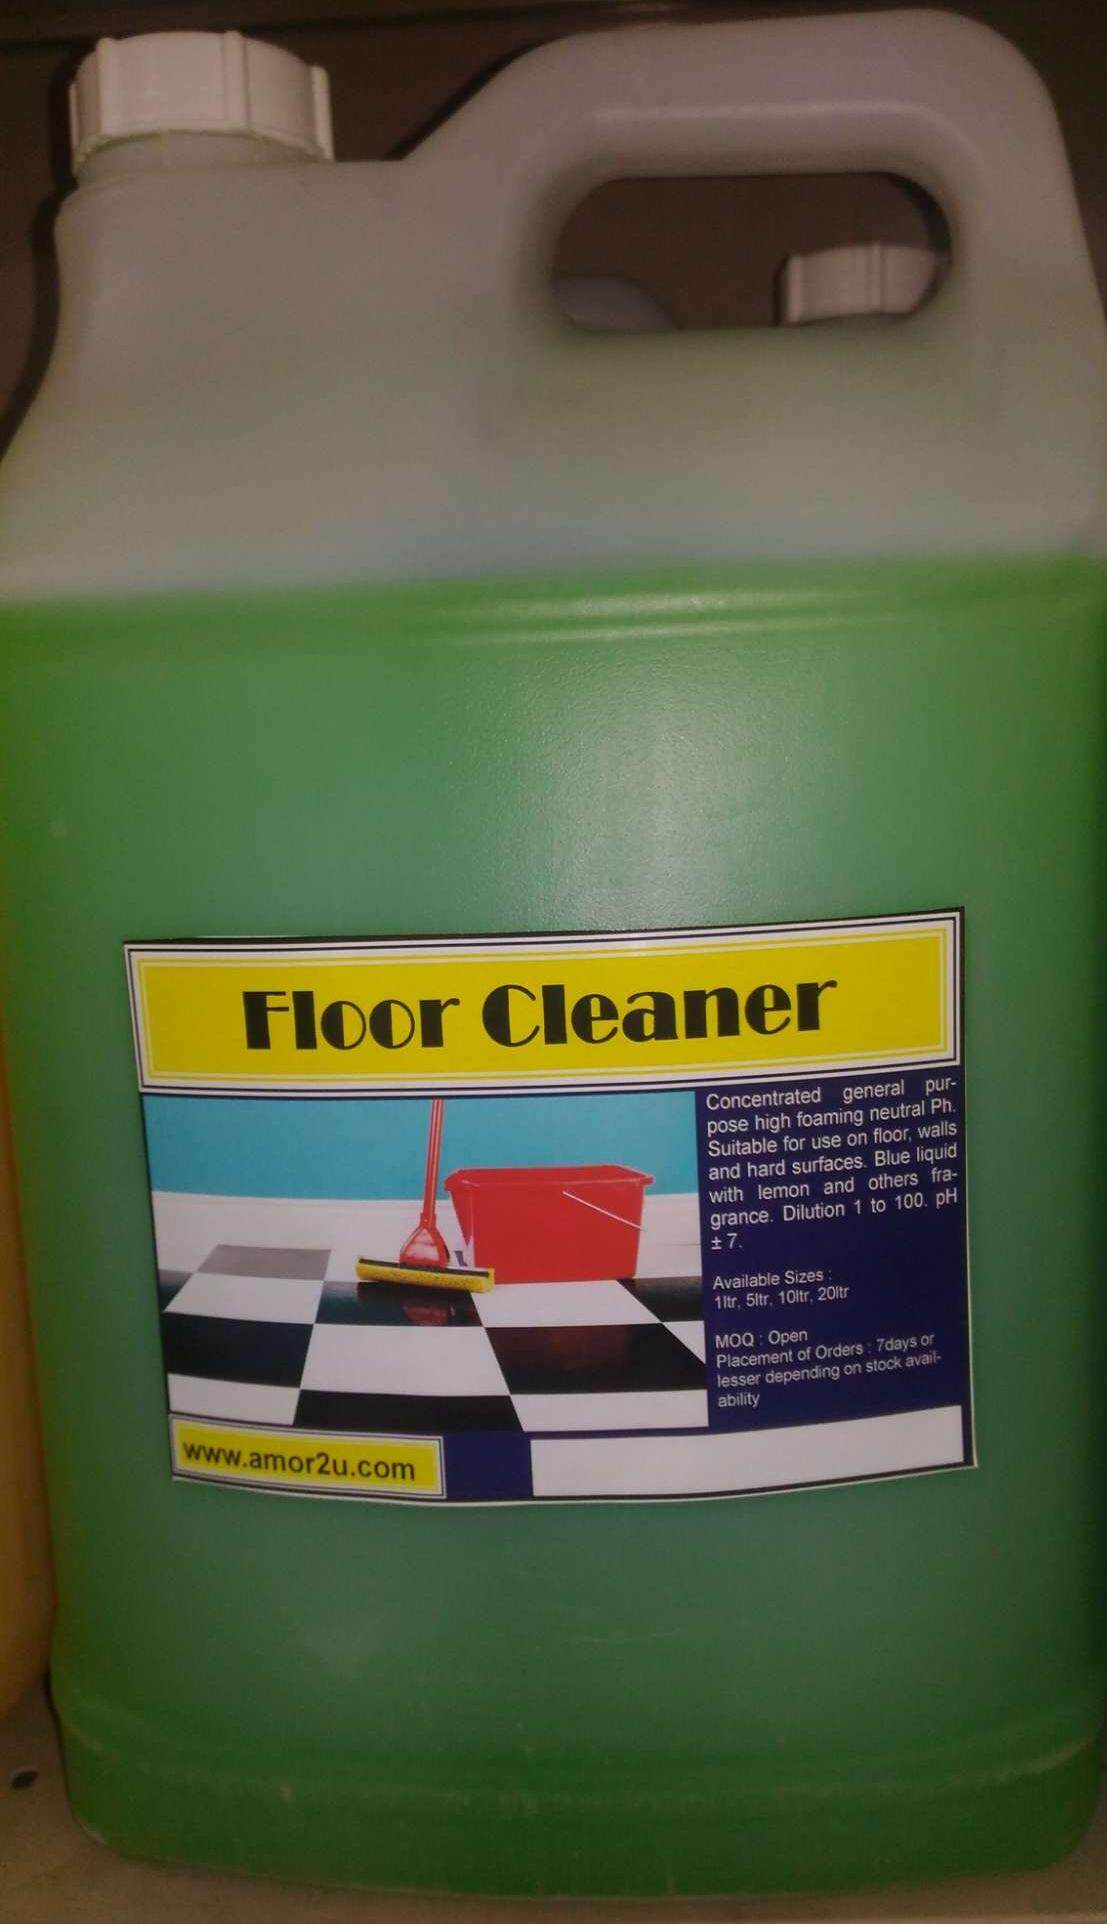 1 drum. Of 10liter lavender or apple flavor floor cleaner